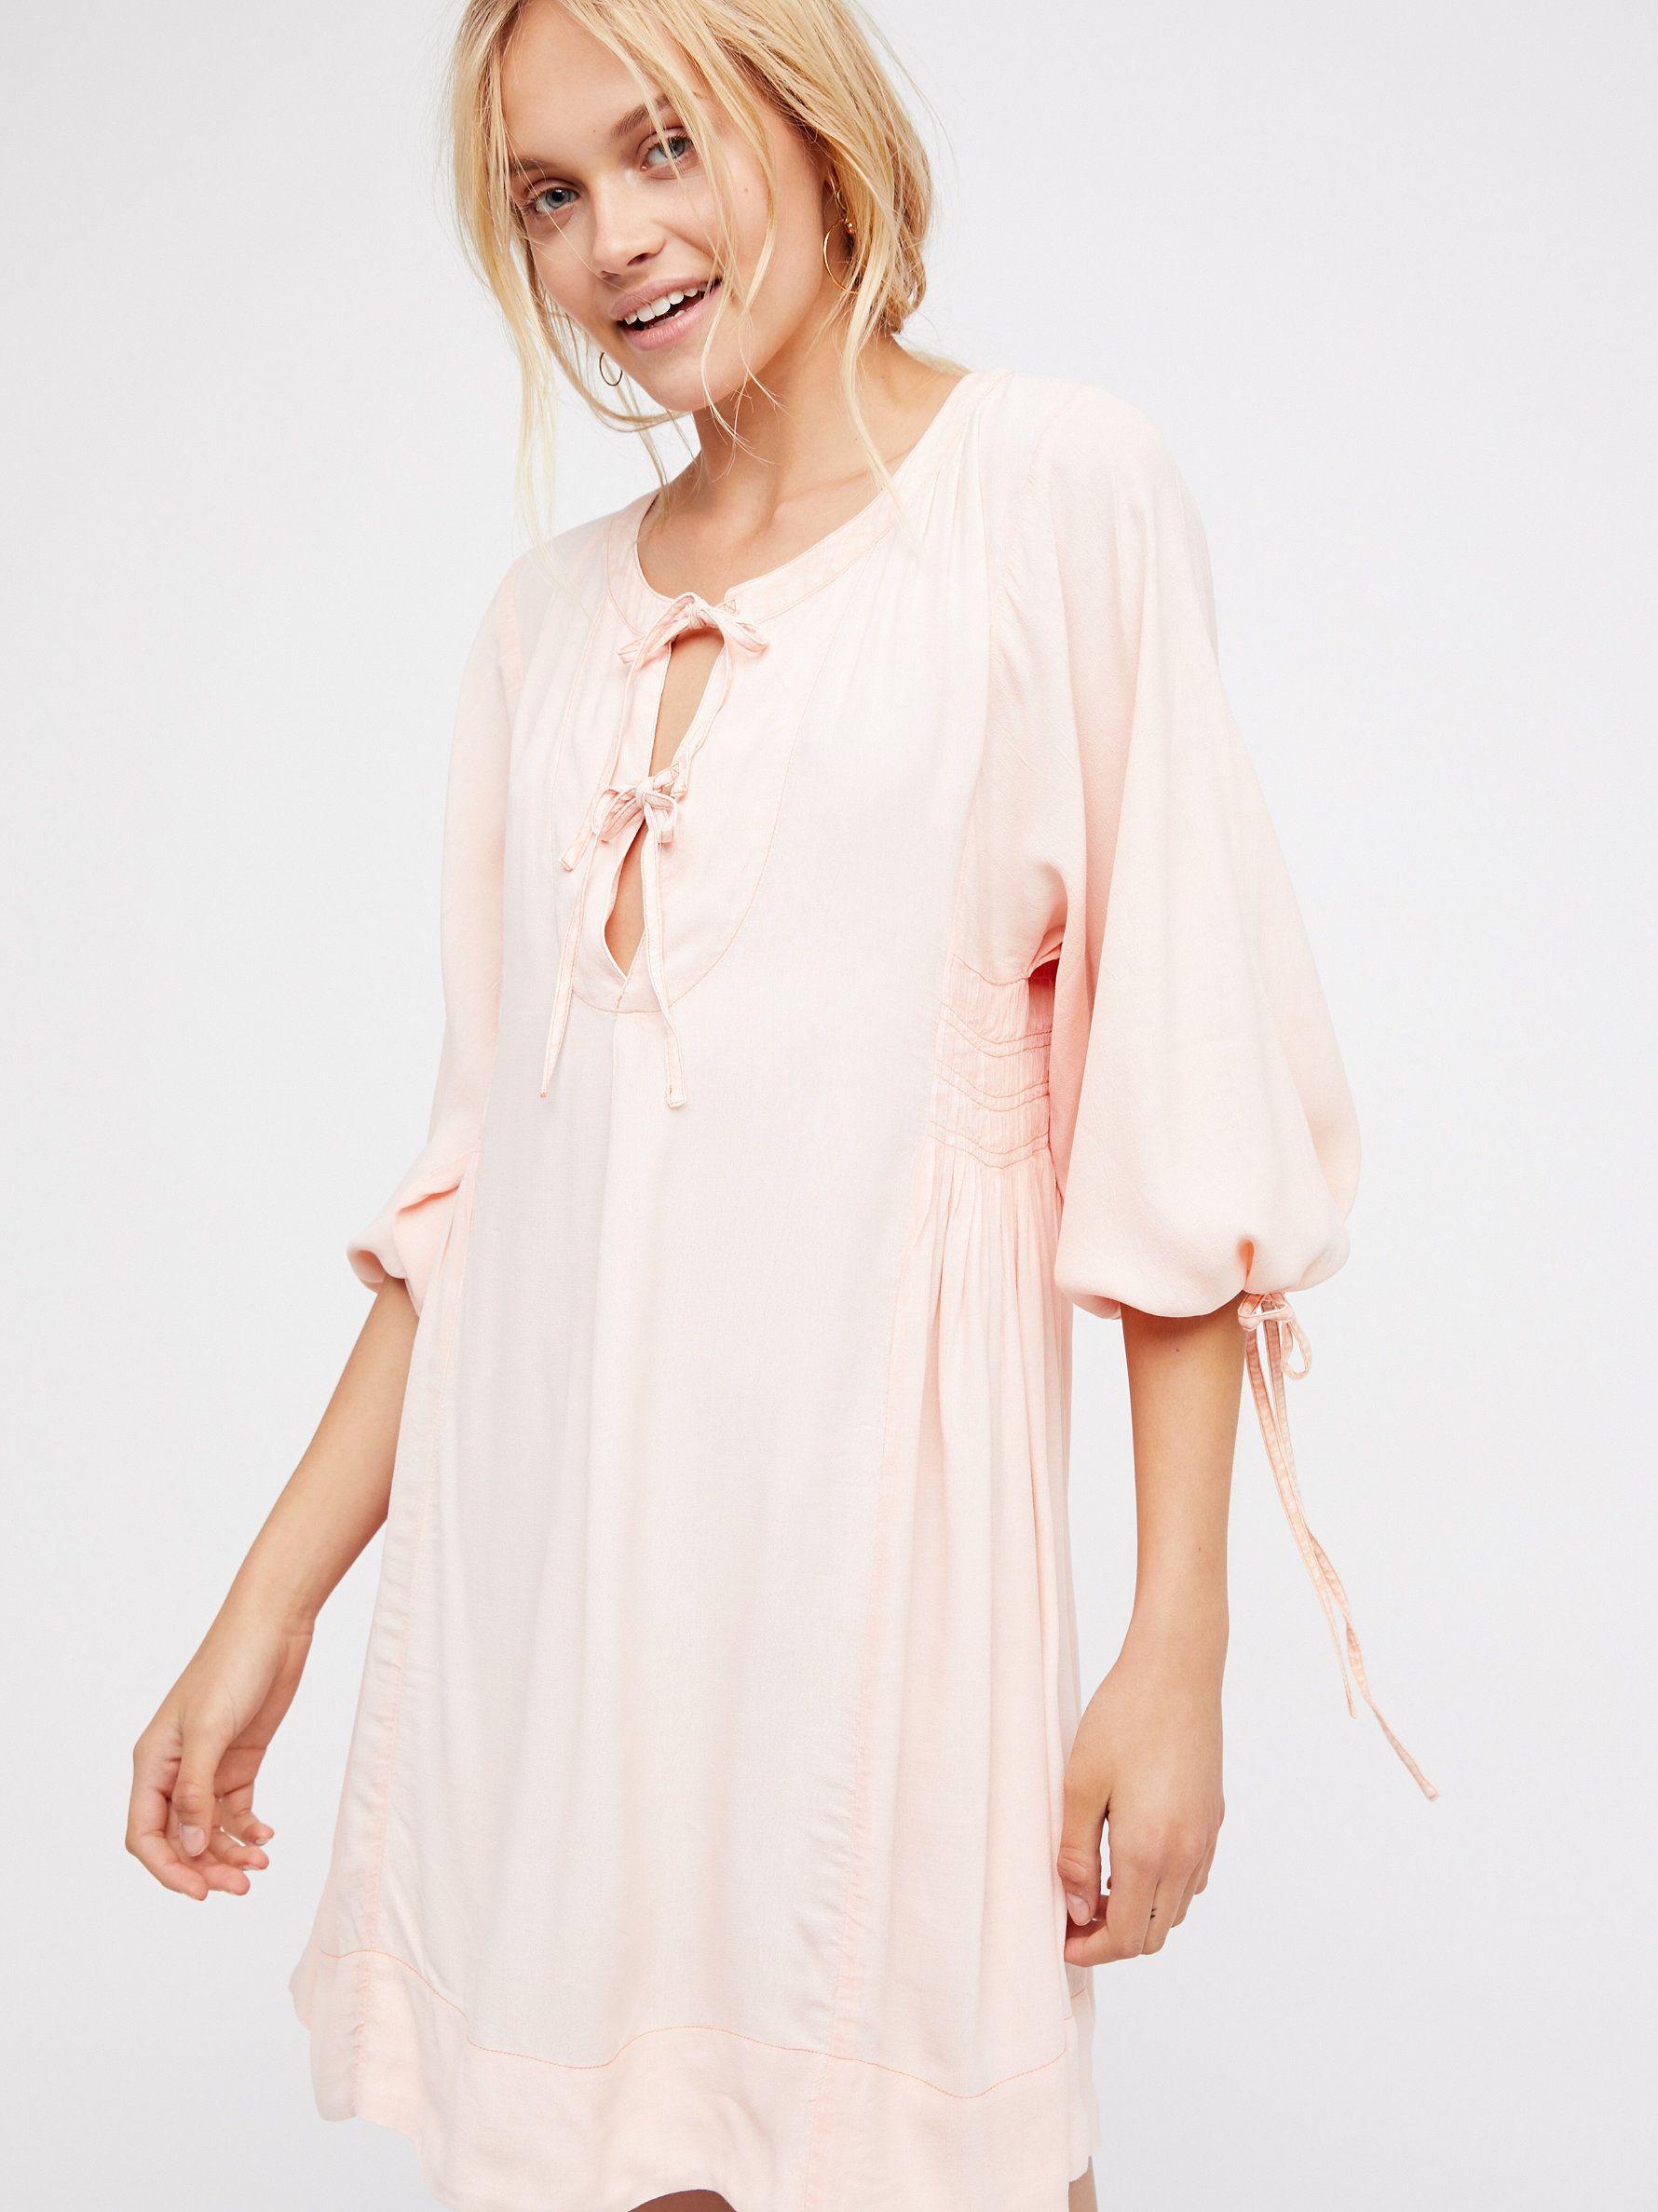 Nomad Mini Dress Mini dress casual, Short dresses casual